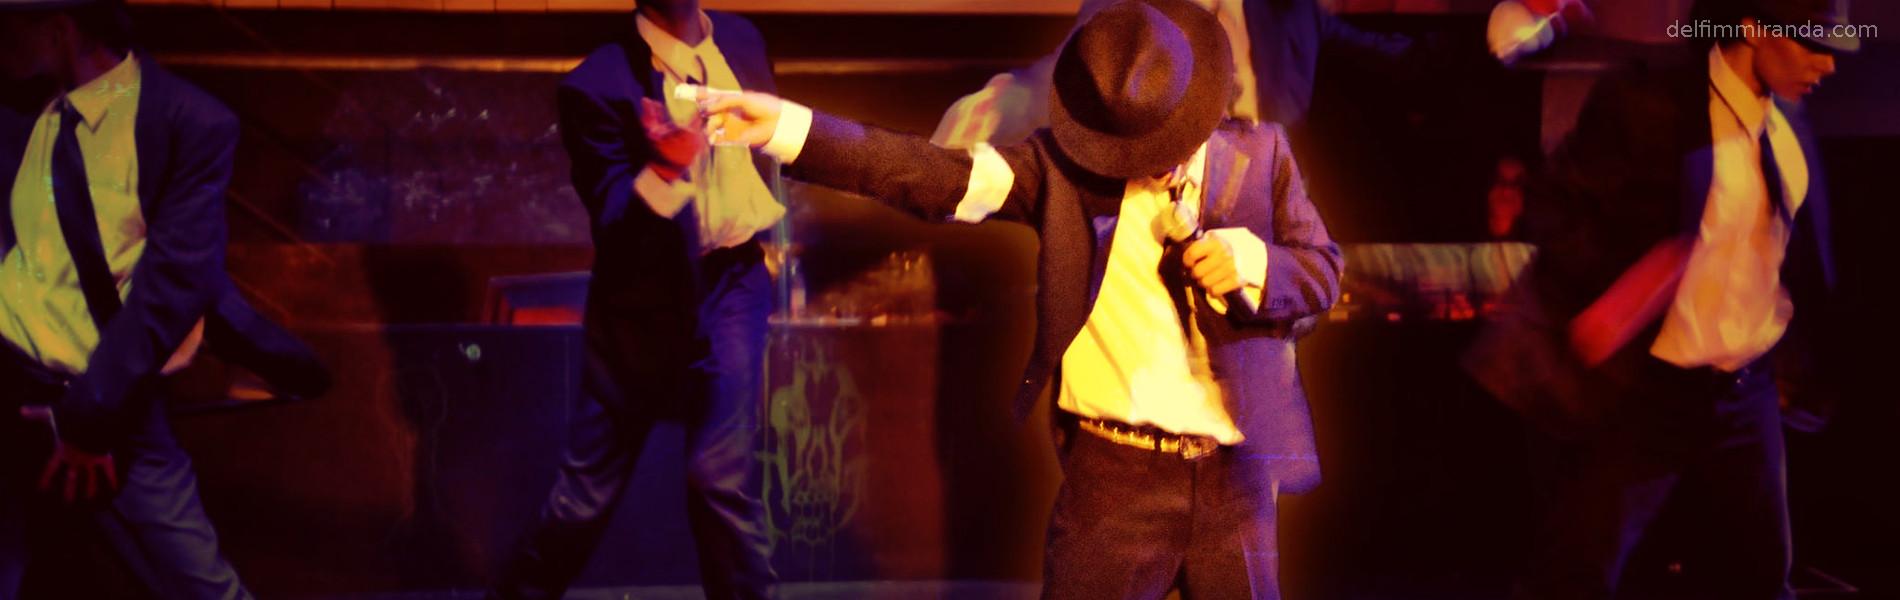 Delfim Miranda - Award Winning Michael Jackson Tribute Artist - Look Alike - Sound Alike - Impersonator Singing and Dancing Like the King of Pop